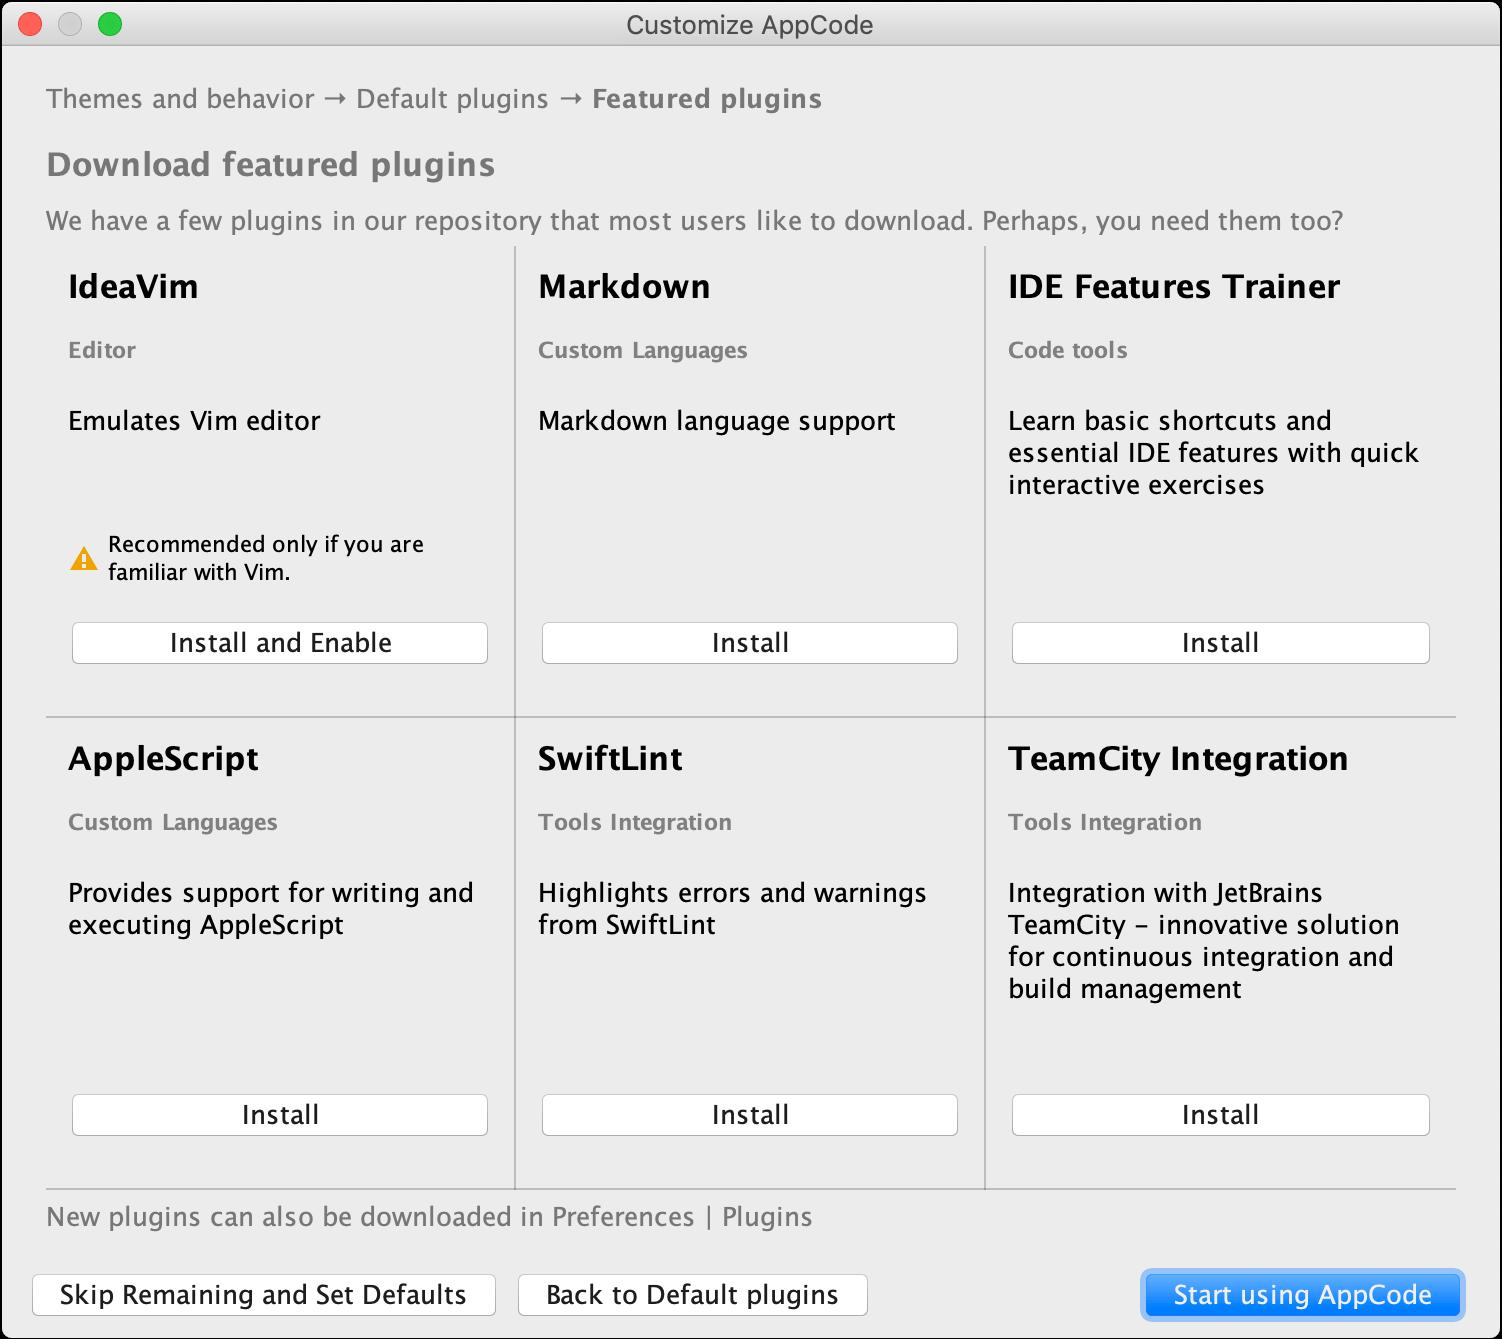 Install additional plugins